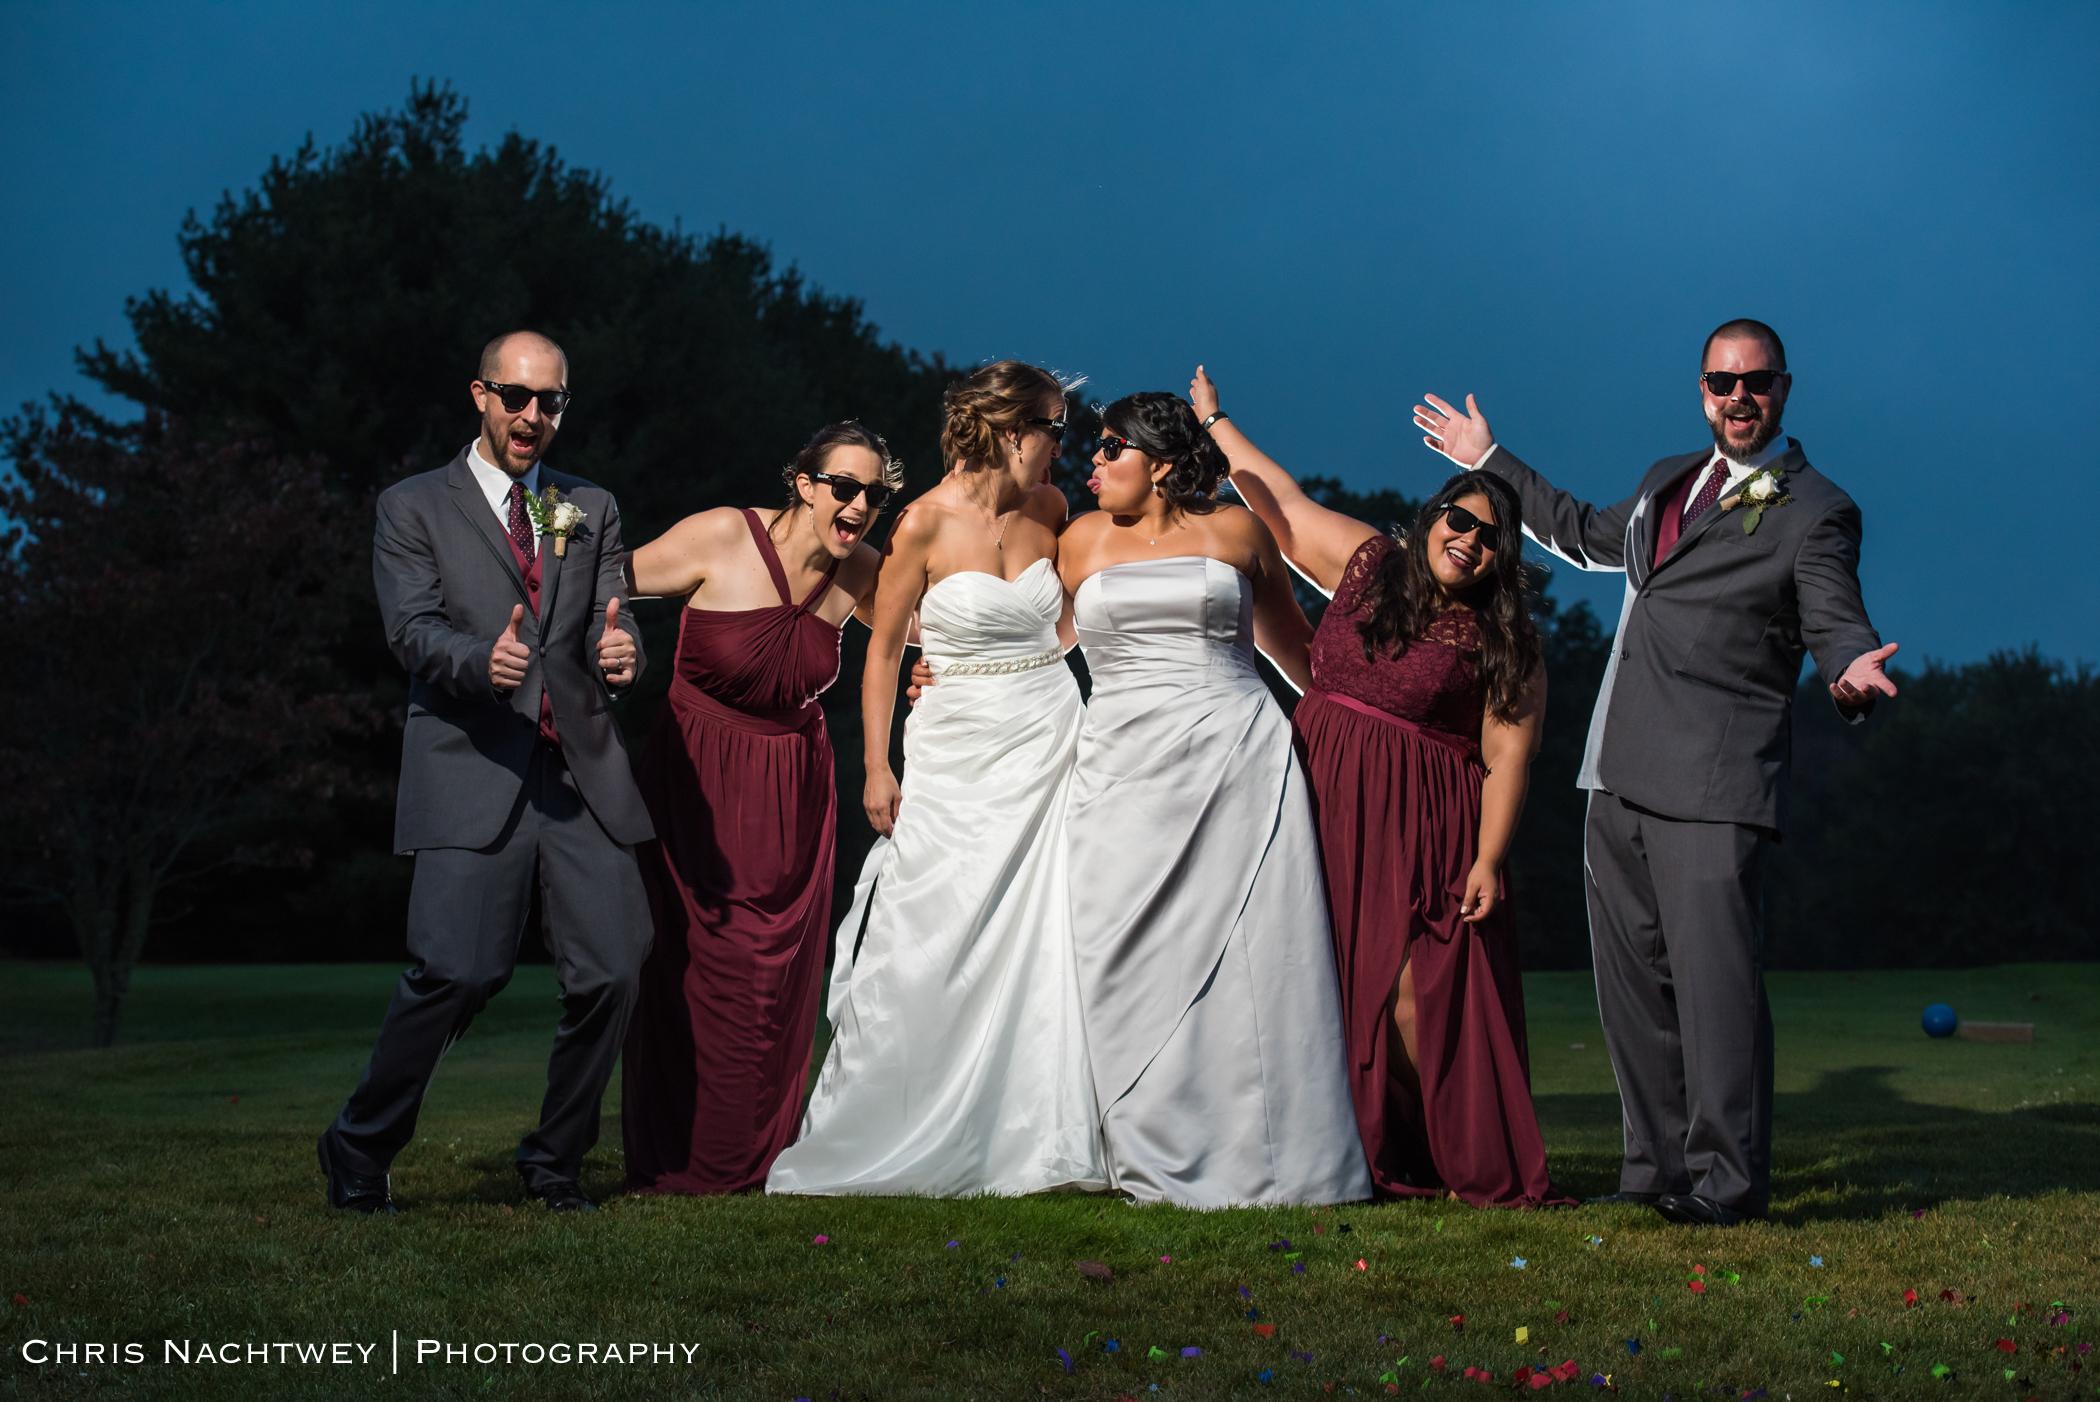 artistic-ct-wedding-photographers-chris-nachtwey-2017-22.jpg